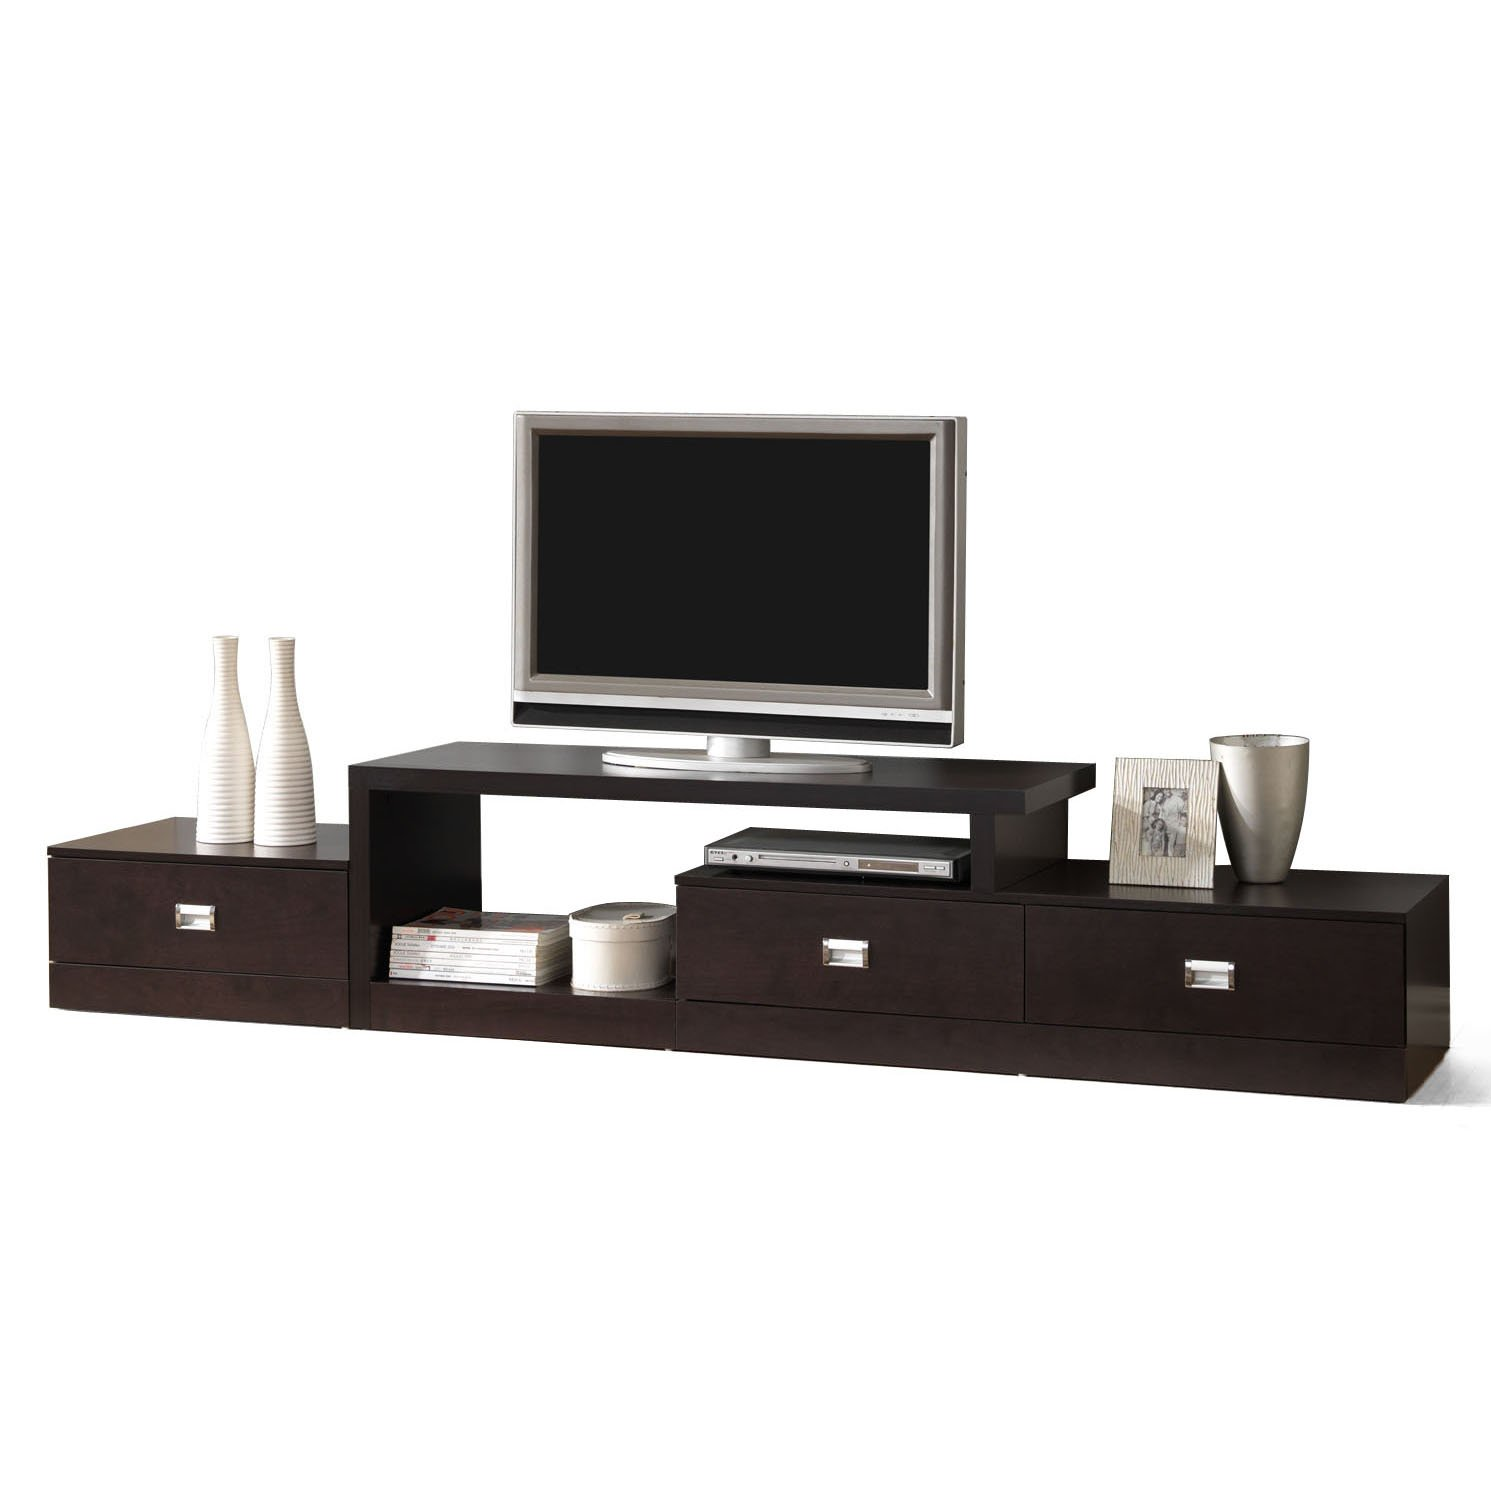 modern tv stand. amazon.com: baxton studio marconi brown asymmetrical modern tv stand: kitchen \u0026 dining tv stand